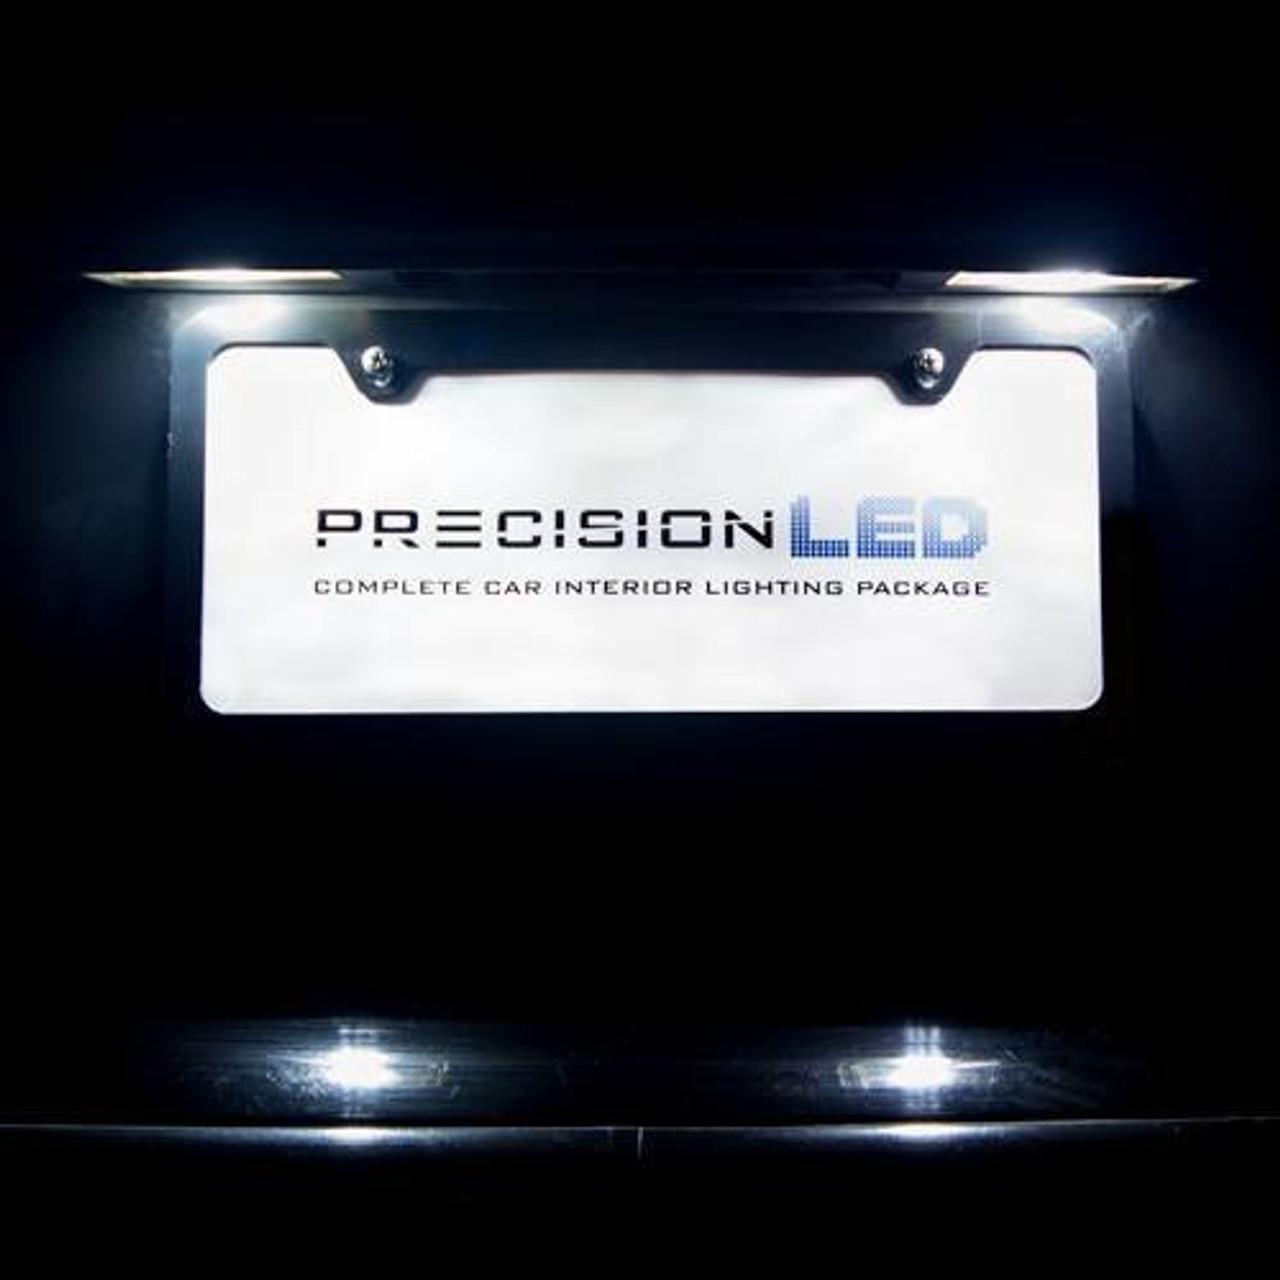 BMW M3 E30 LED License Plate Lights (1986-1991)